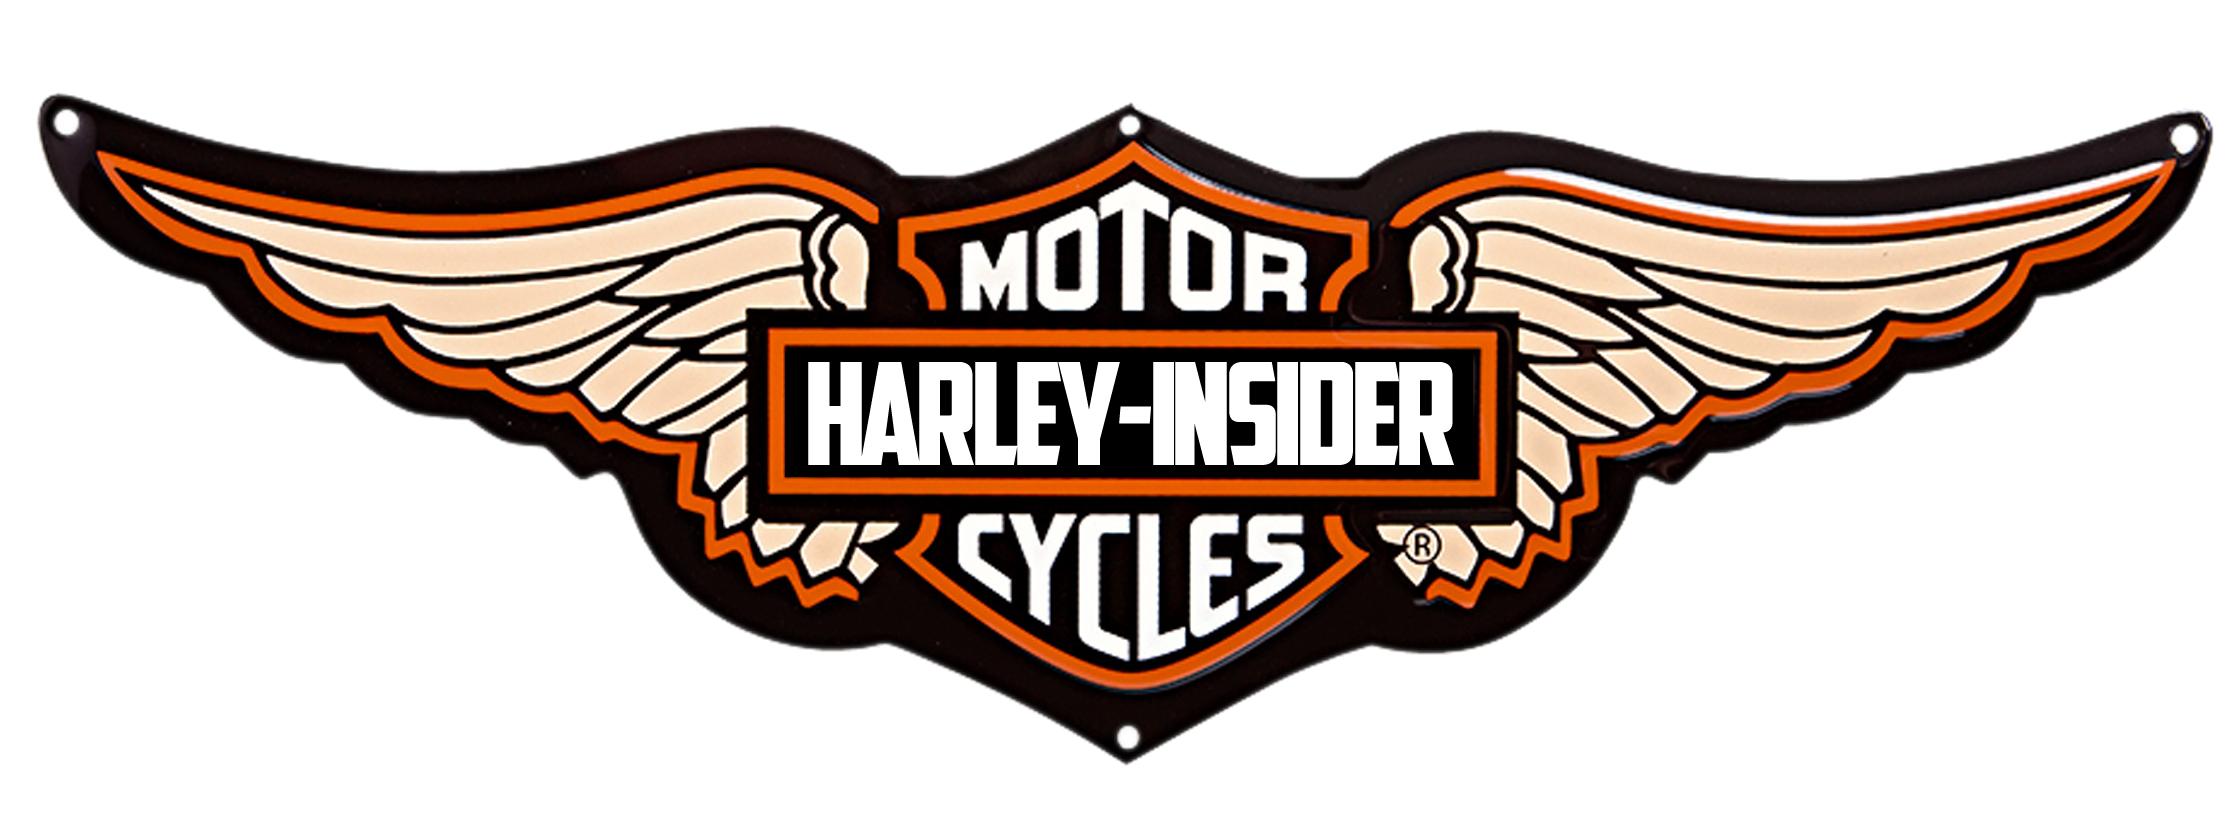 Download Harley Davidson Logo Wings Png HQ PNG Image ...